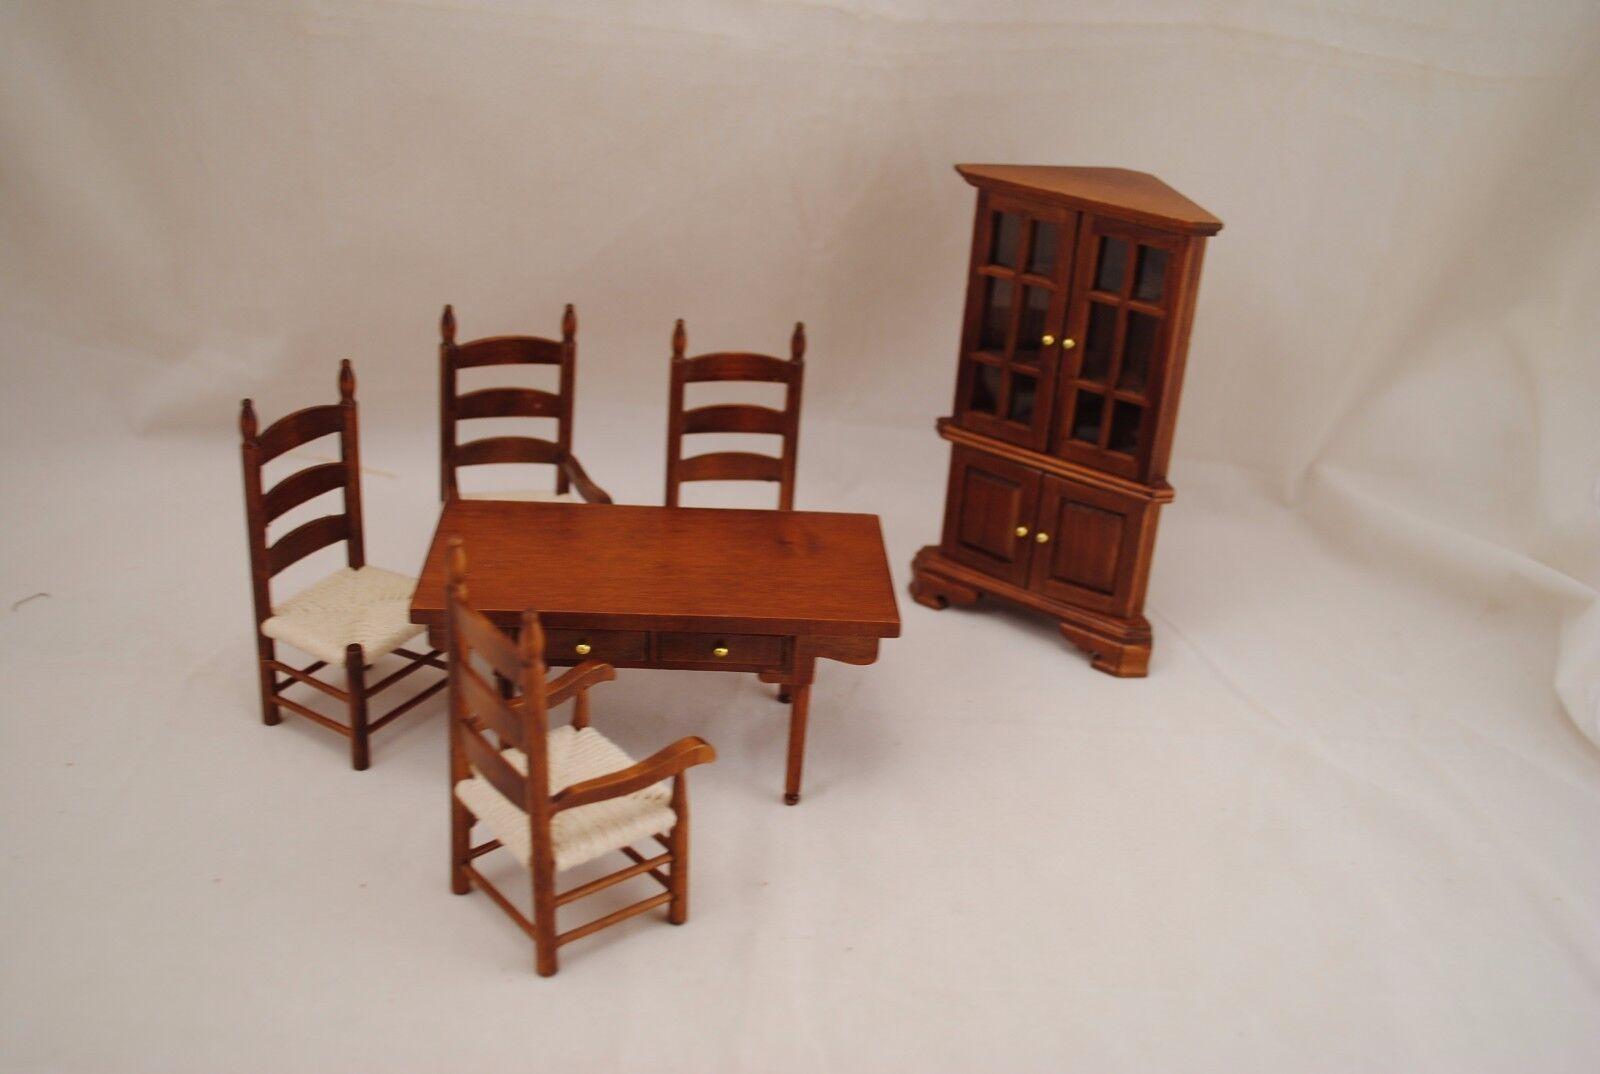 Cocina   Comedor Set-Nuez-t6039 Dollhouse Miniatura De 6 Piezas 1 12 Scale